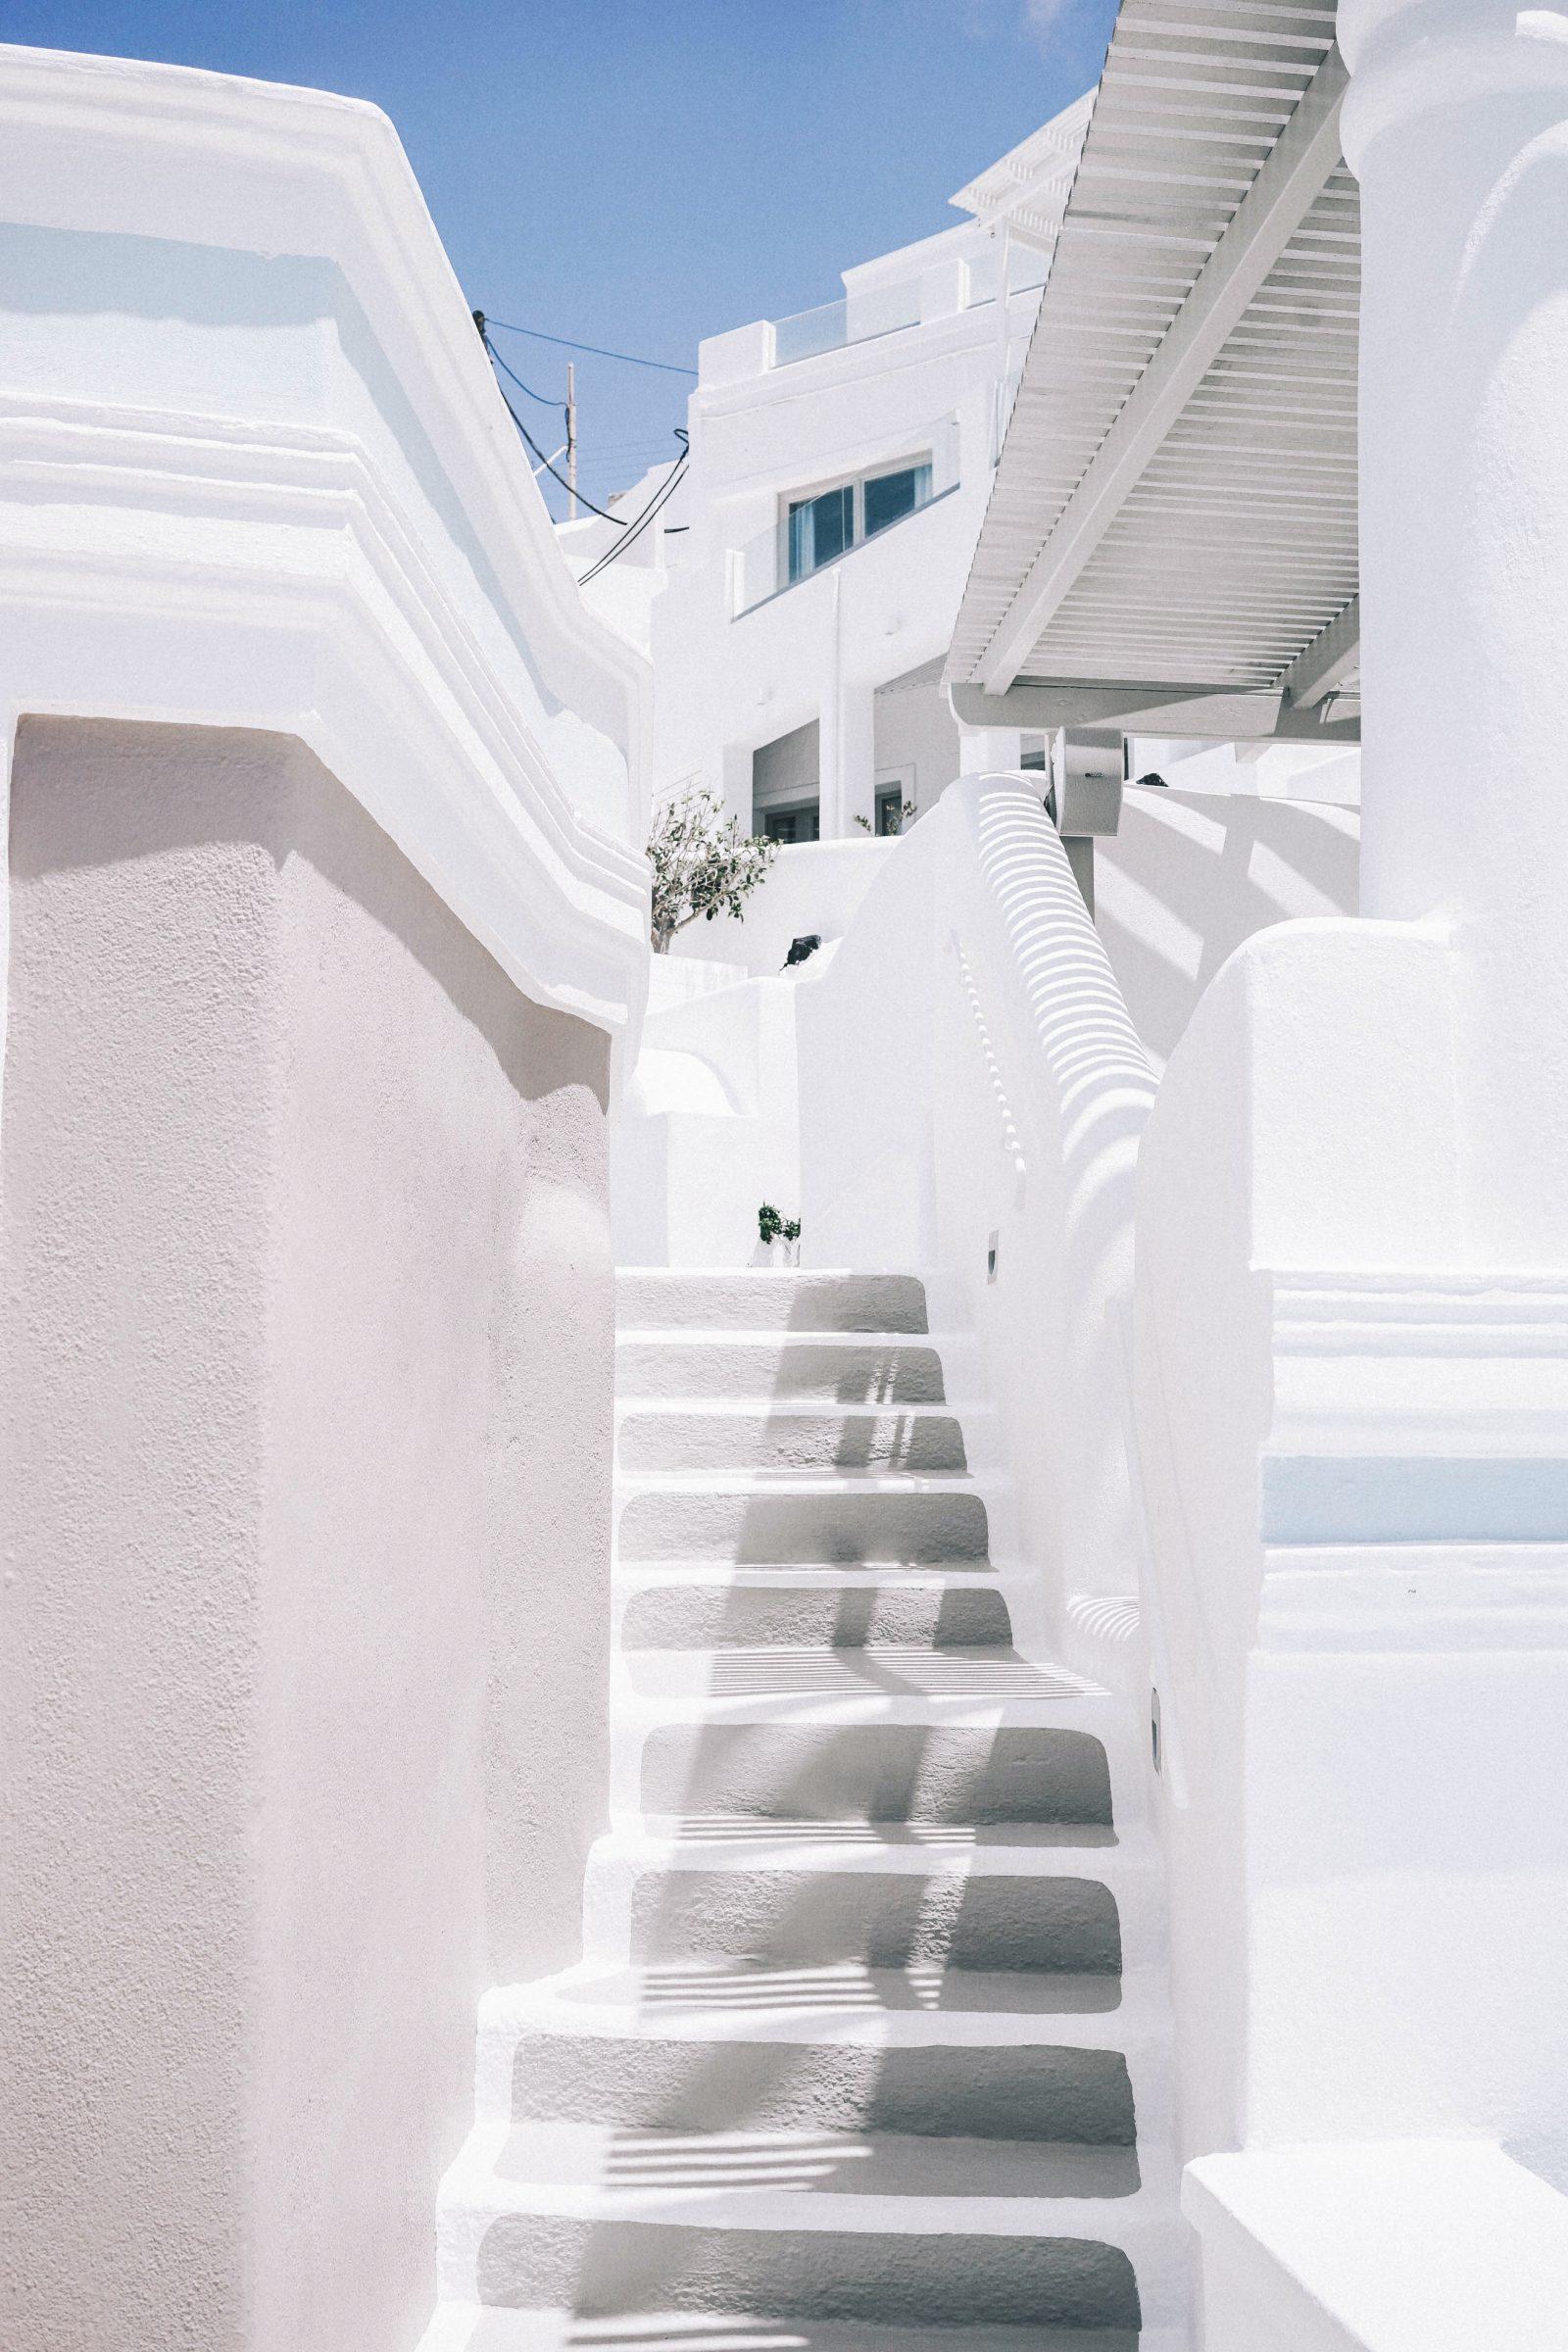 Blue_Dress-Soludos_Escapes-Soludos_Espadrilles-Canotier-Hat-Lack_Of_Color-Summer-Santorini-Collage_Vintage-150